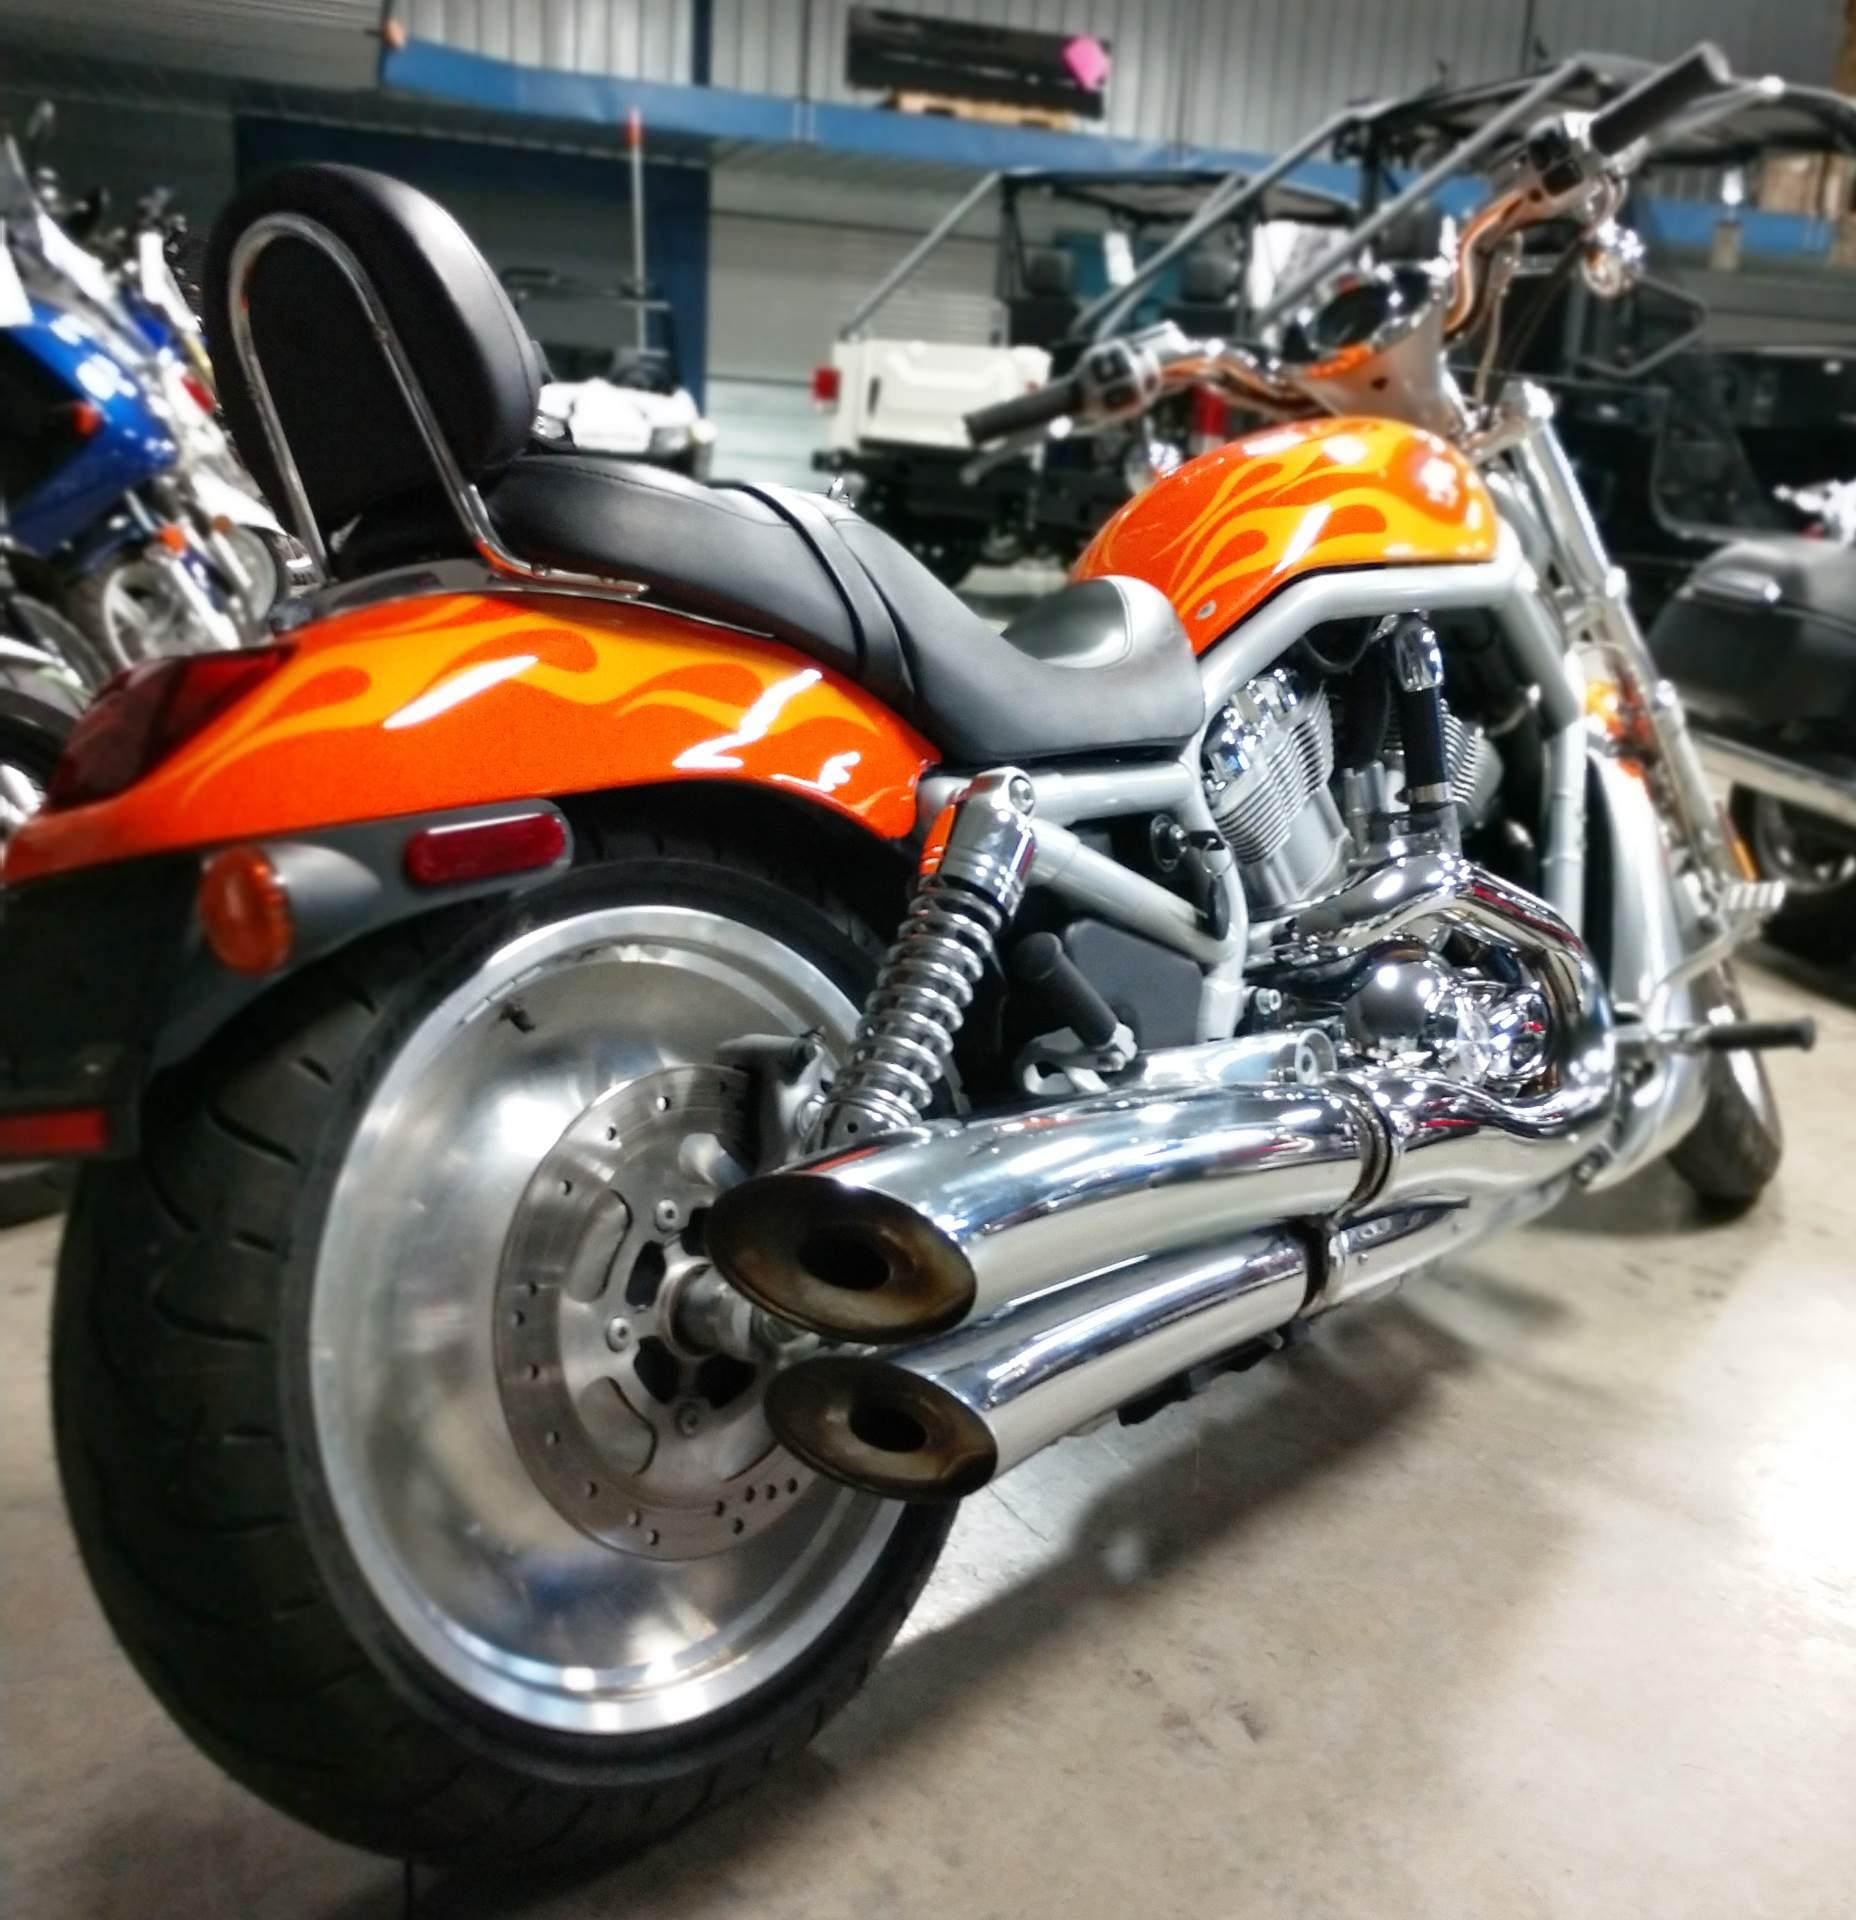 2003 Harley-Davidson VRSCA  V-Rod 6